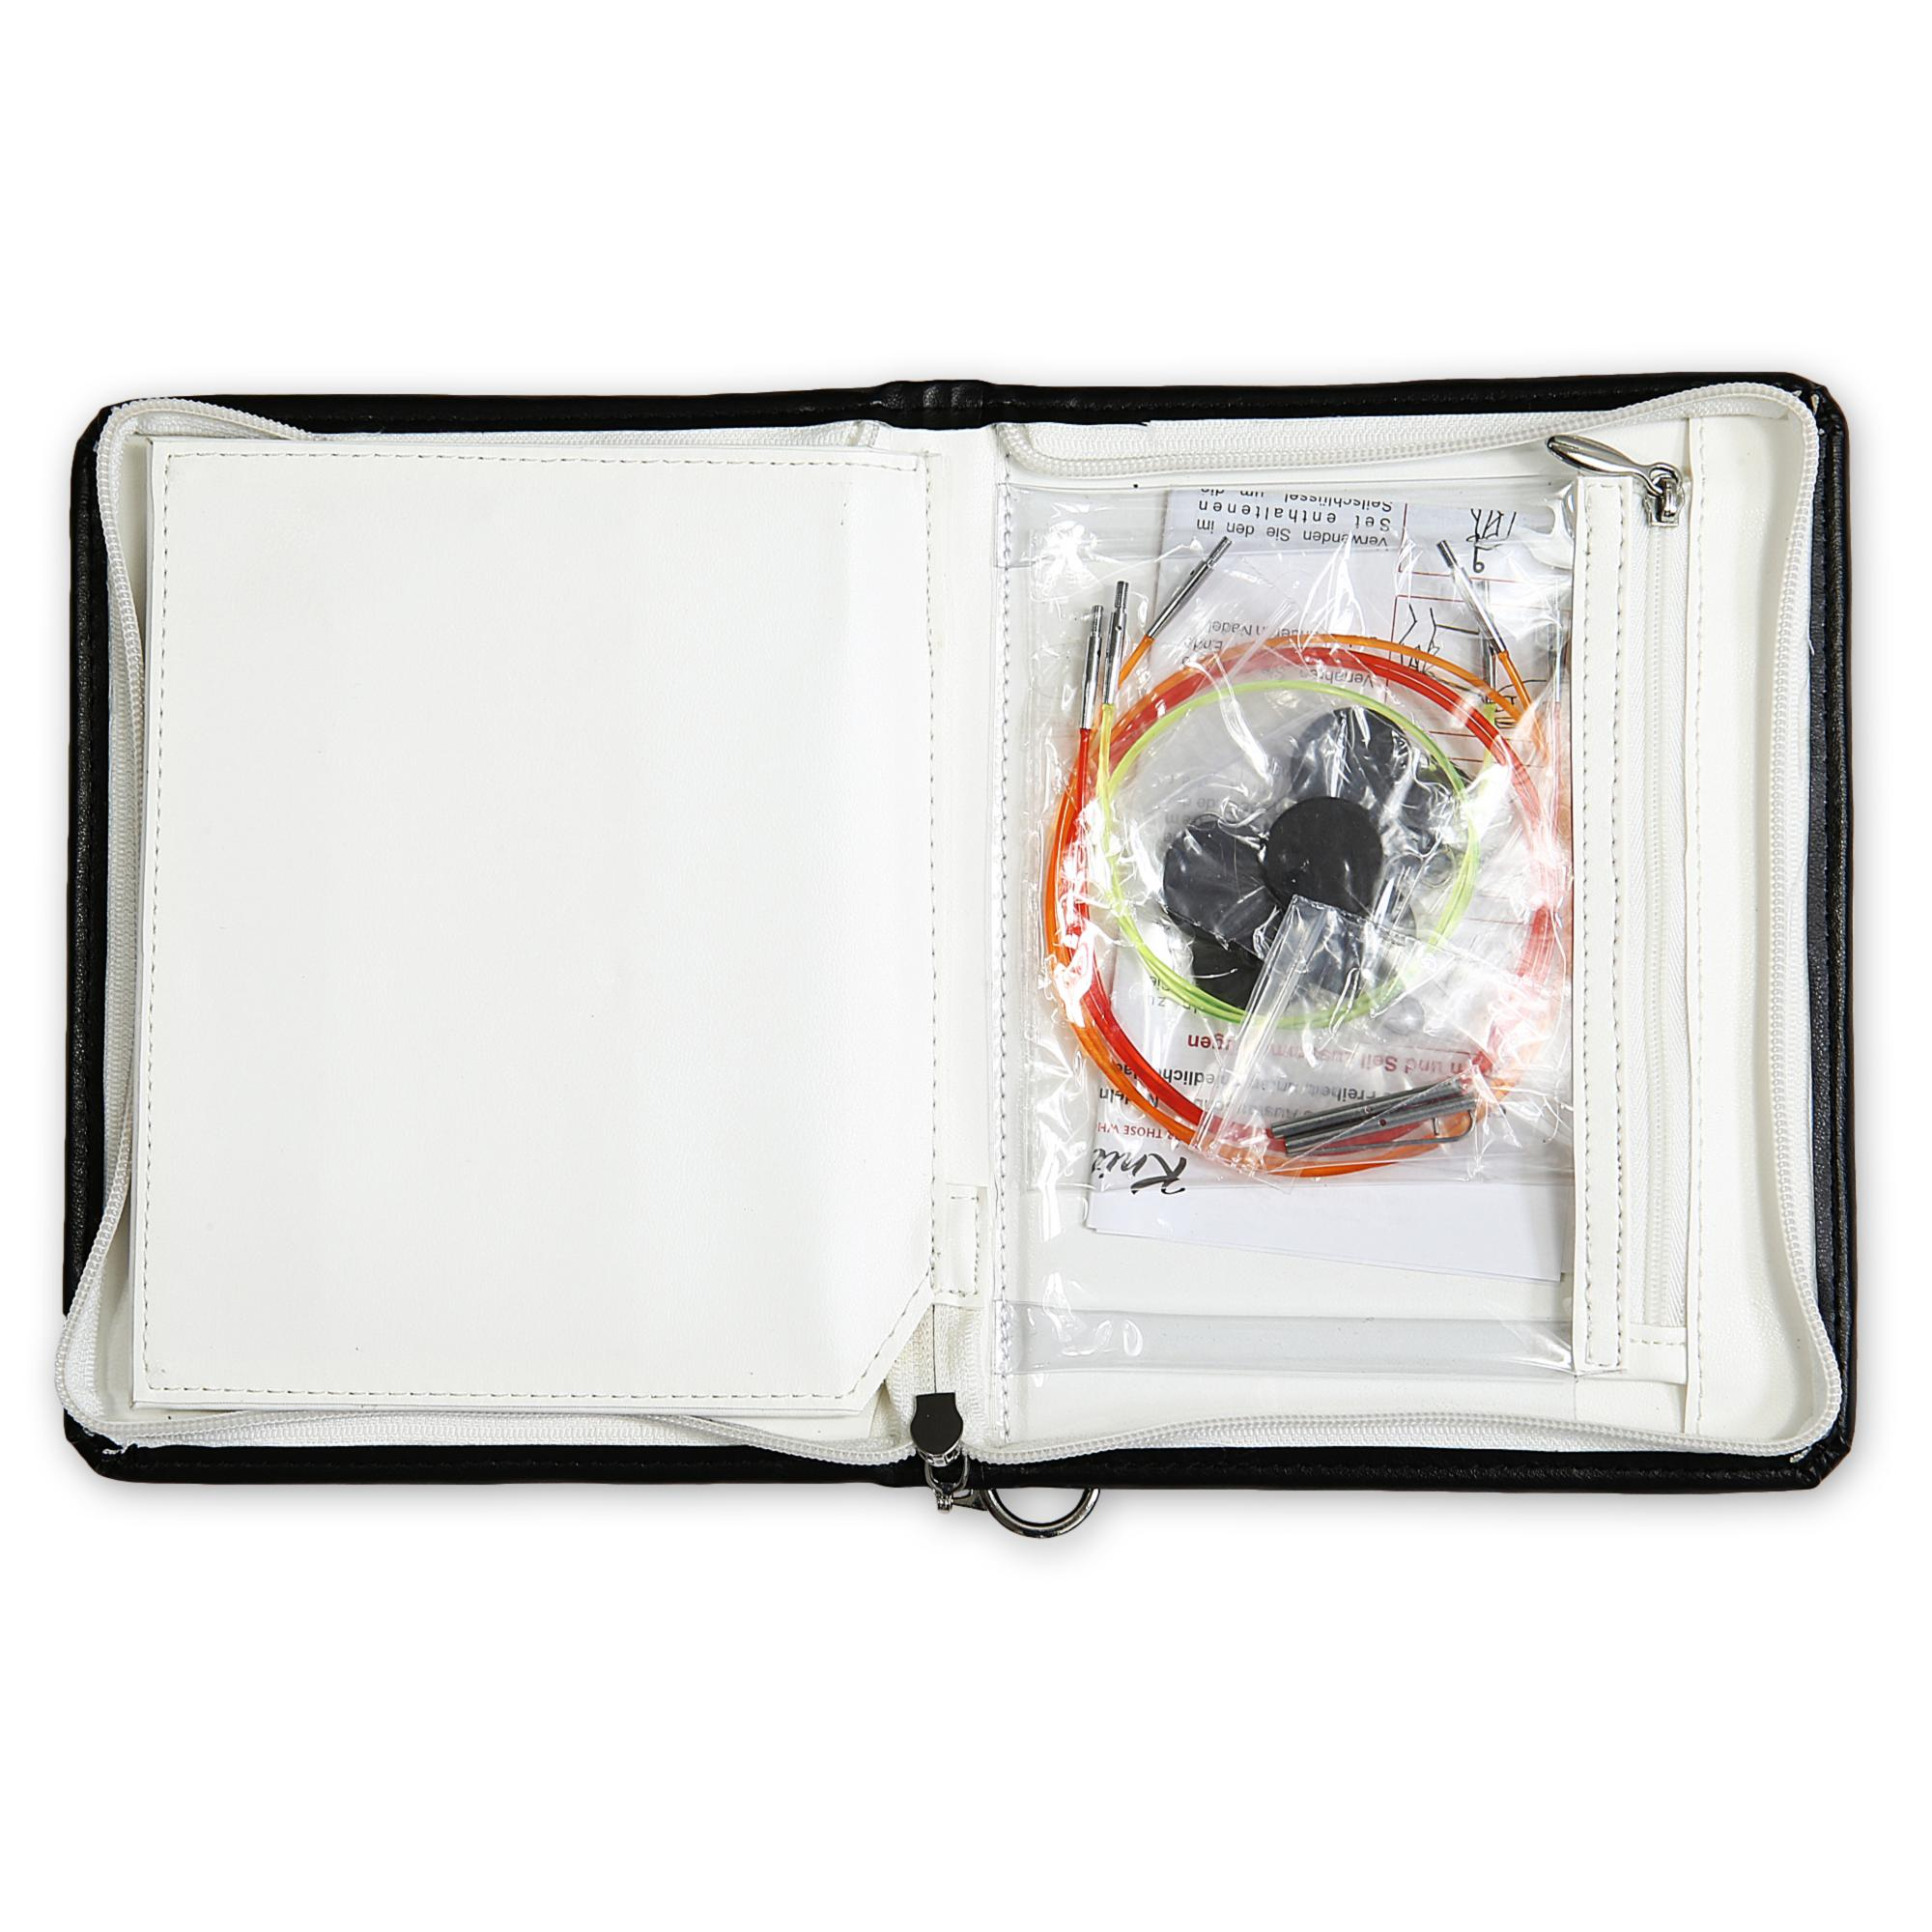 71506 Набор съемных спиц Marblz Deluxe KnitPro 4